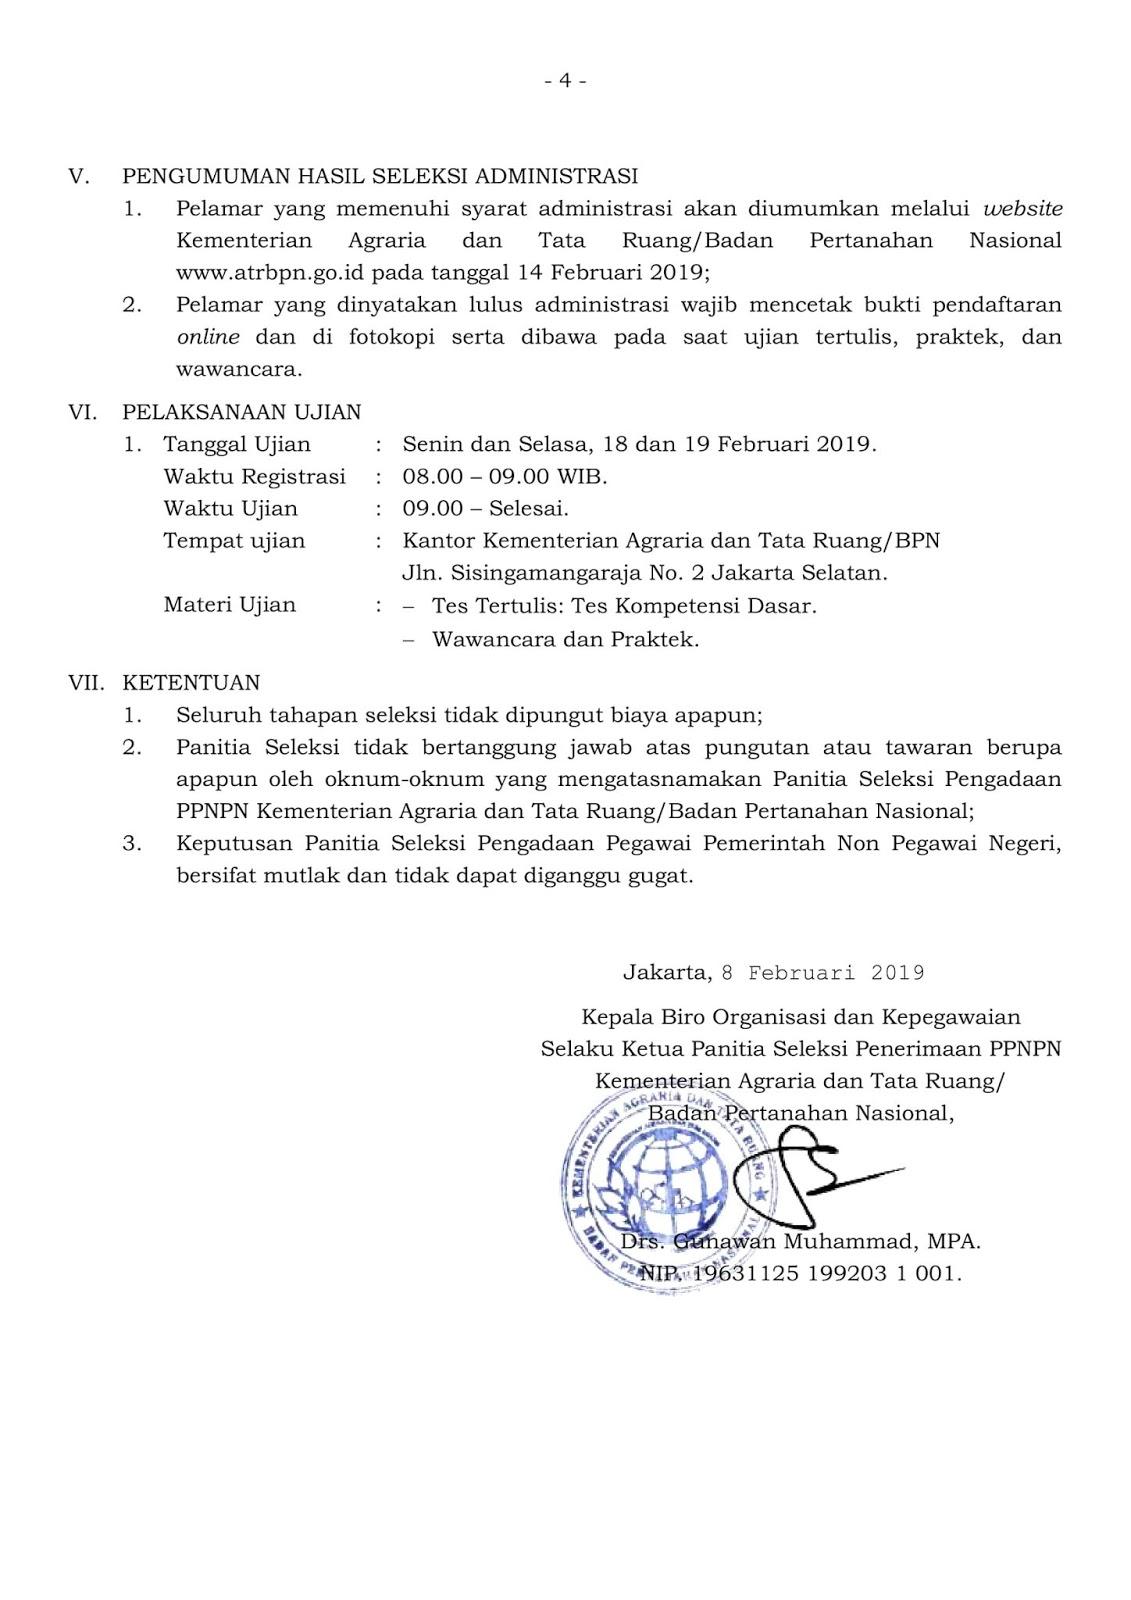 Lowongan Kerja Kementerian Agraria dan Tata Ruang Minimal D3 S1 Semua Jurusan